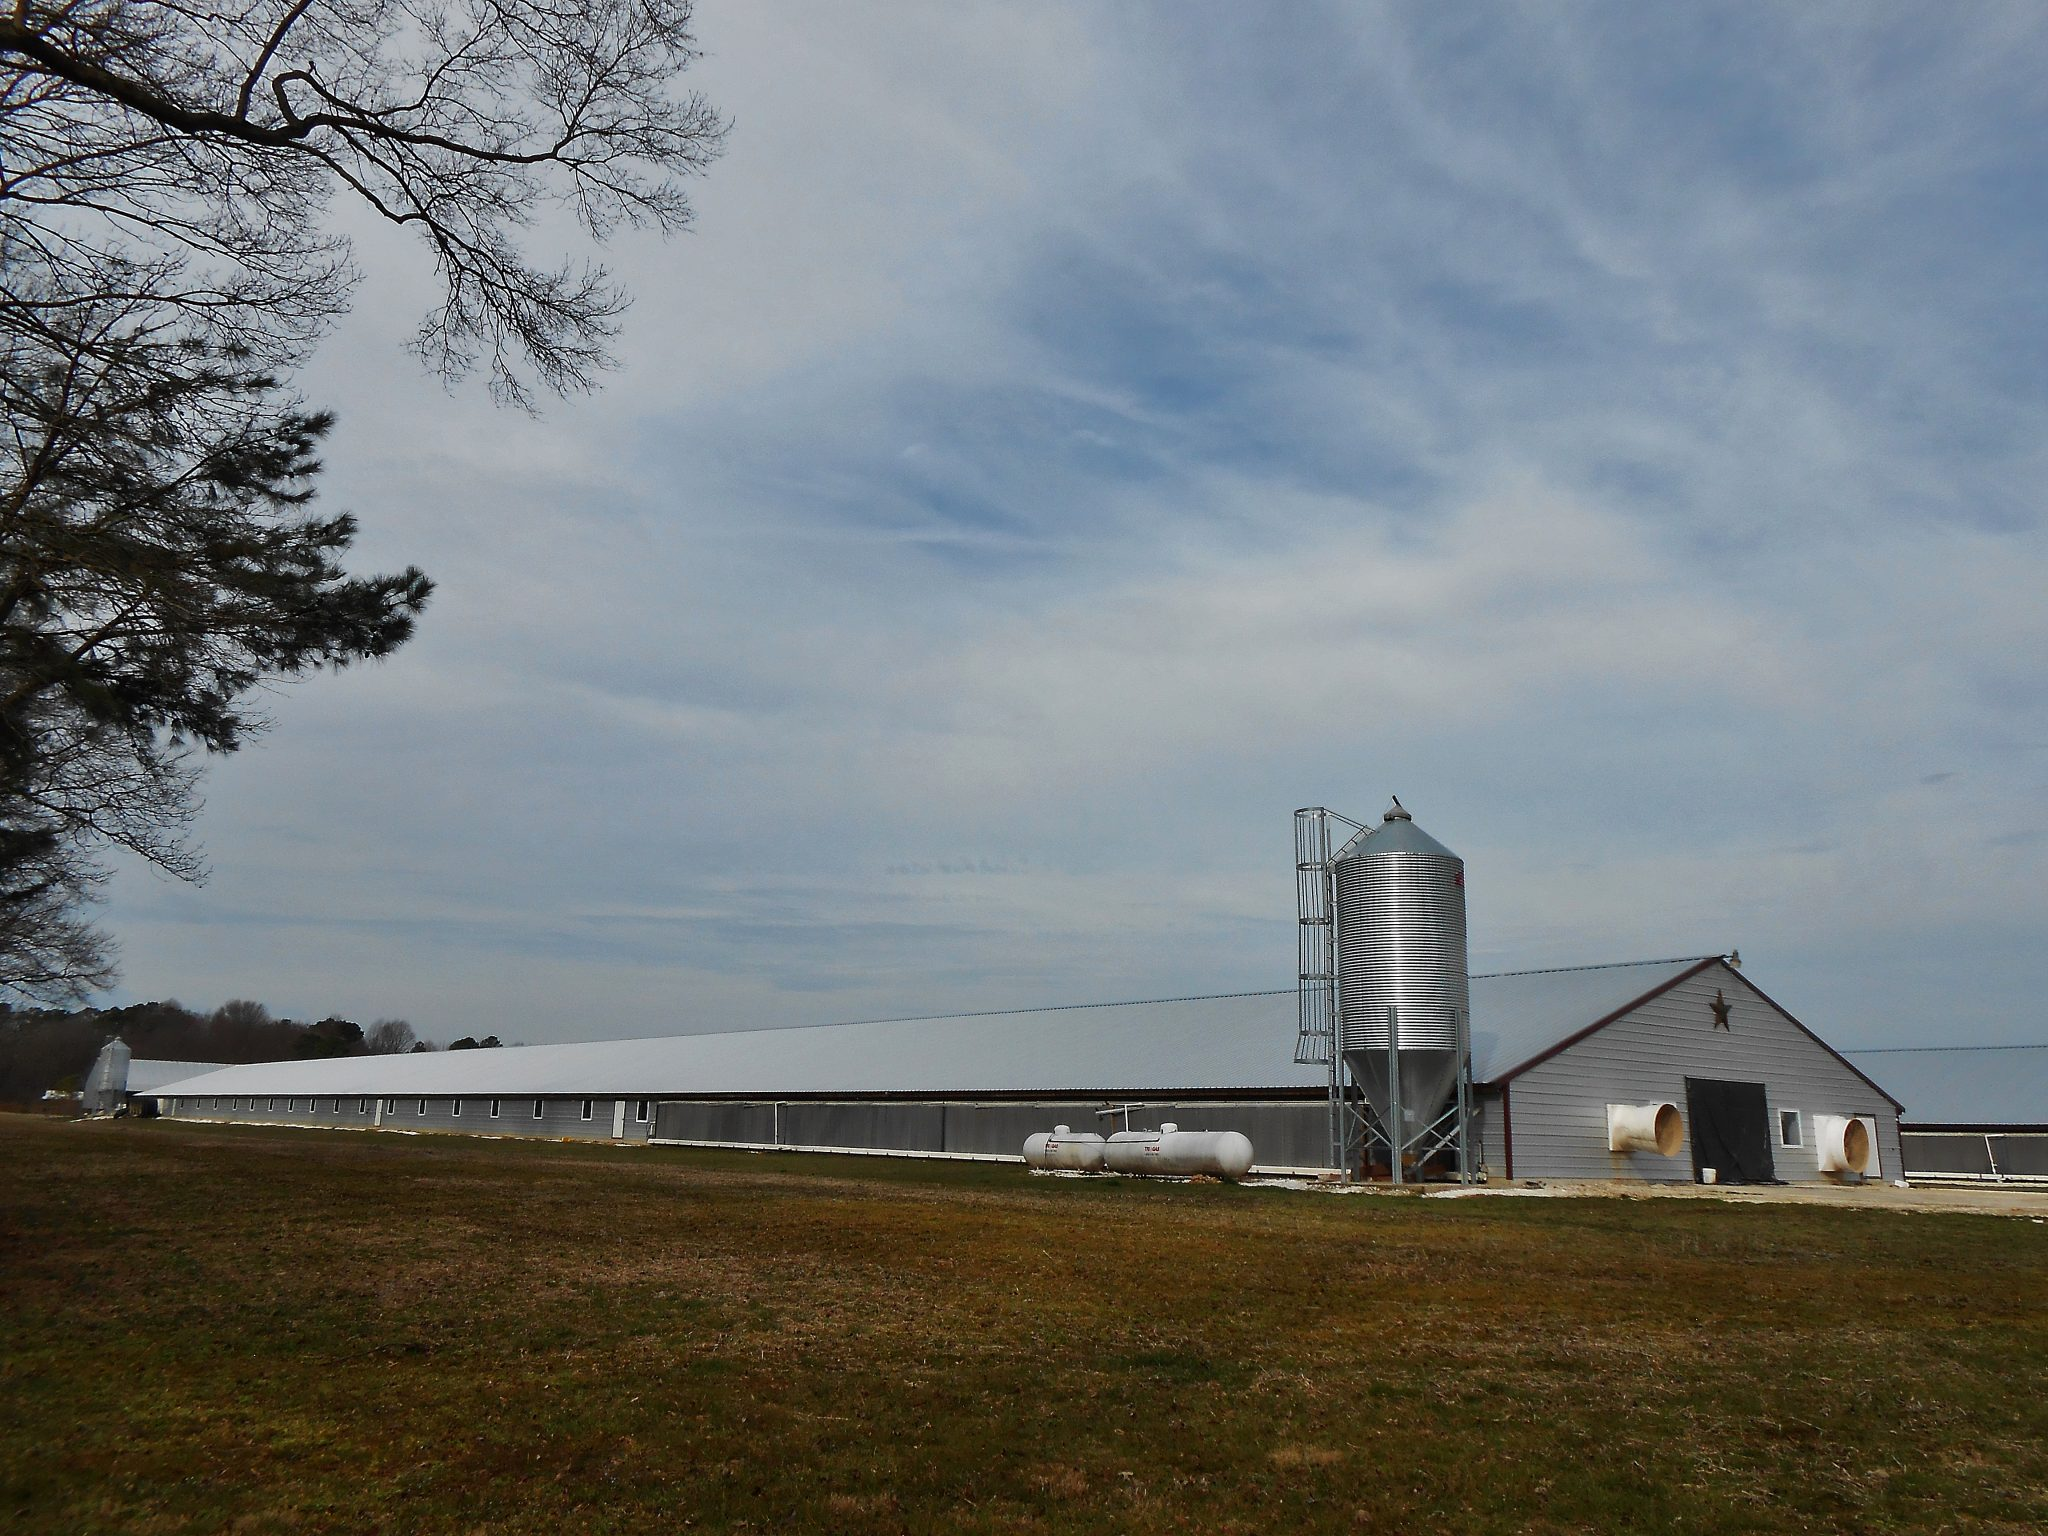 Chicken farm Delaware Maryland border